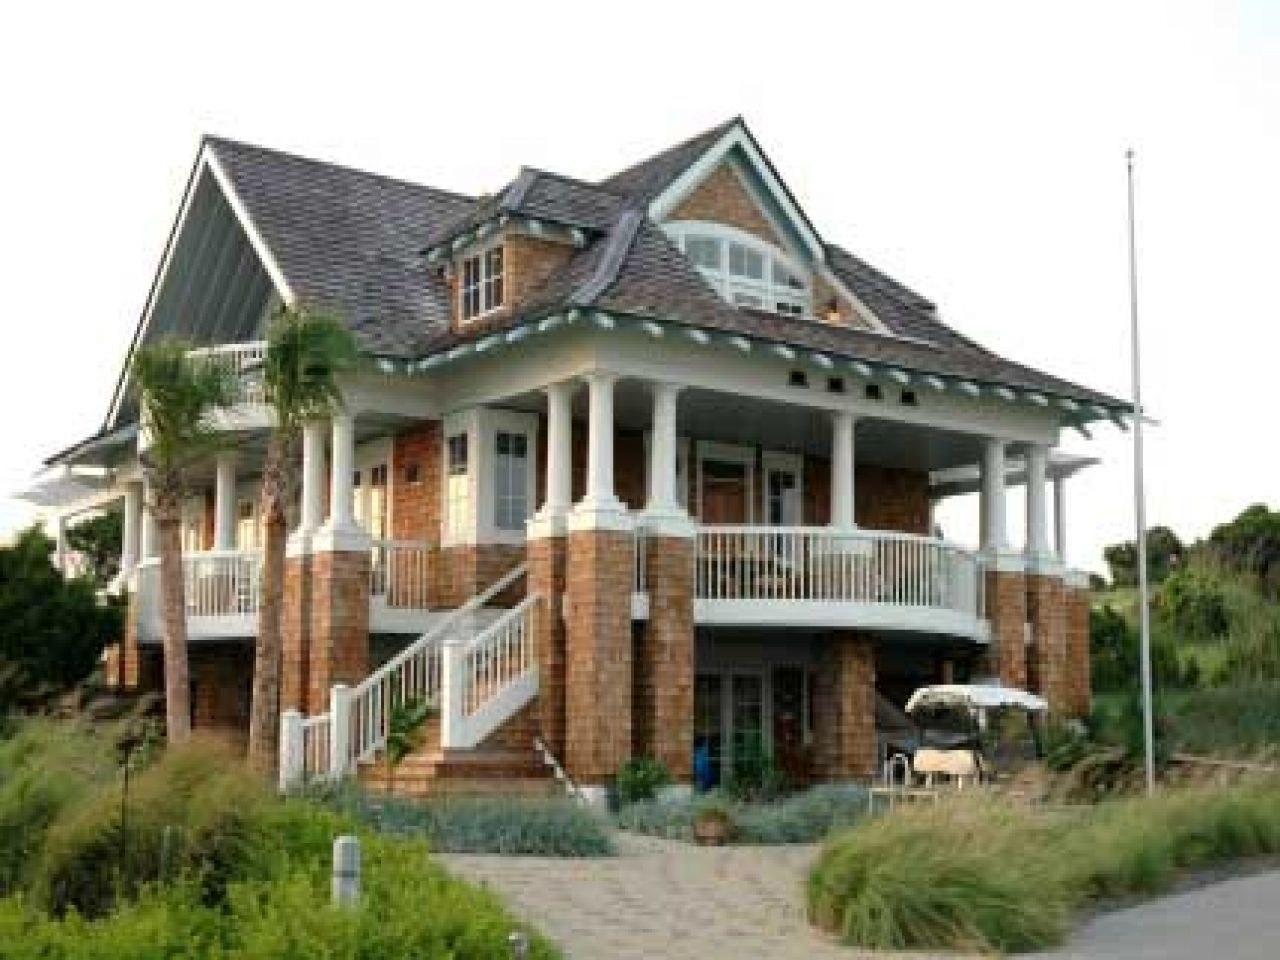 Coastal living house plans on pilings modular beach design for Coastal living house plans on pilings